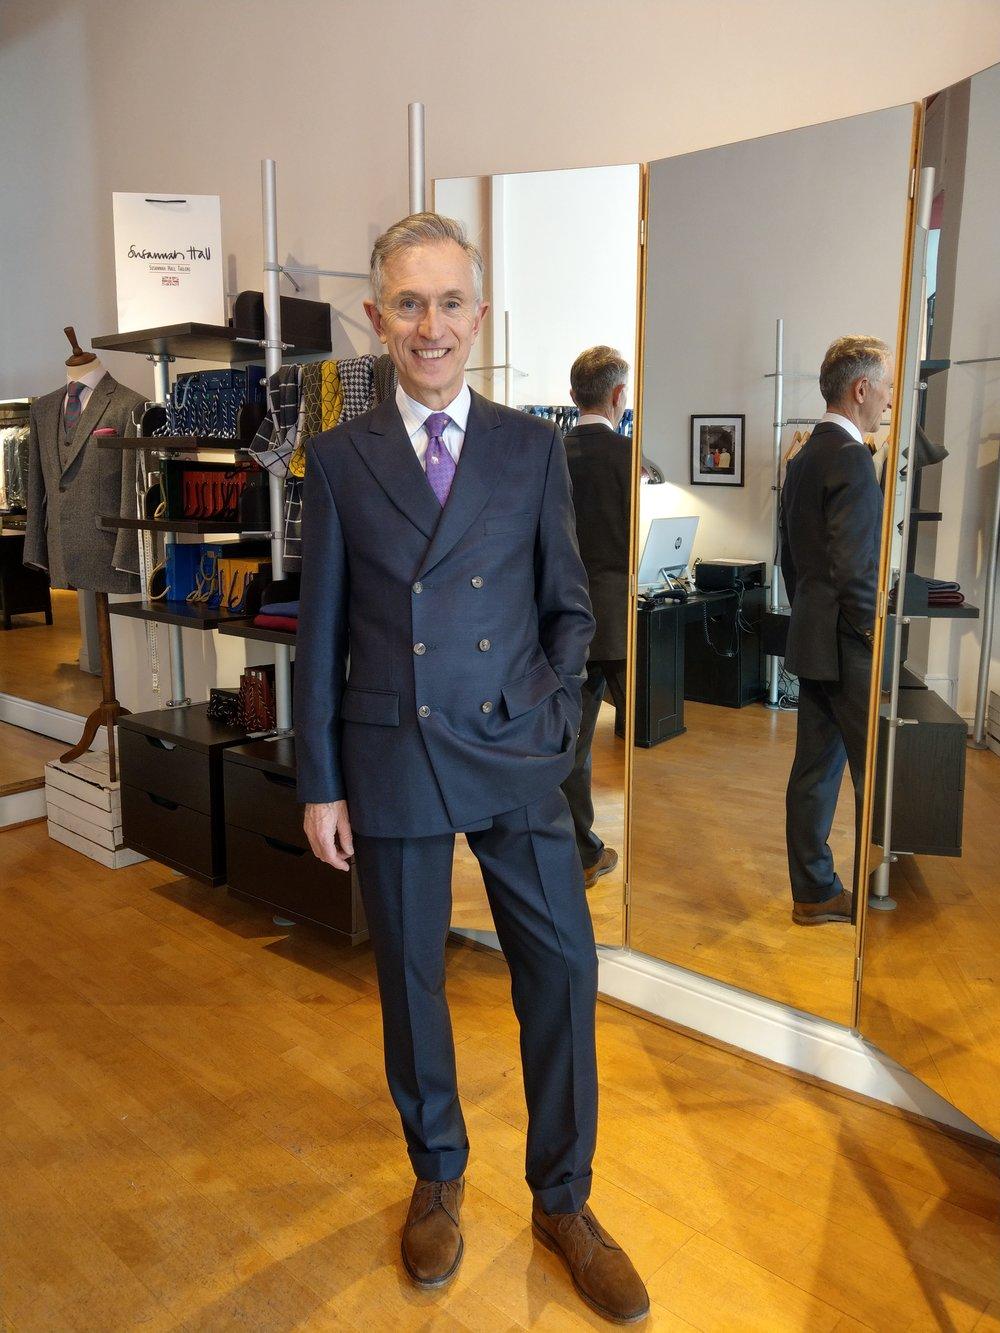 grey-fox-blog-david-evans-susannah-hall-tailor-bespoke-british-made-fully-canvas-dormeuil-double-breasted.jpg